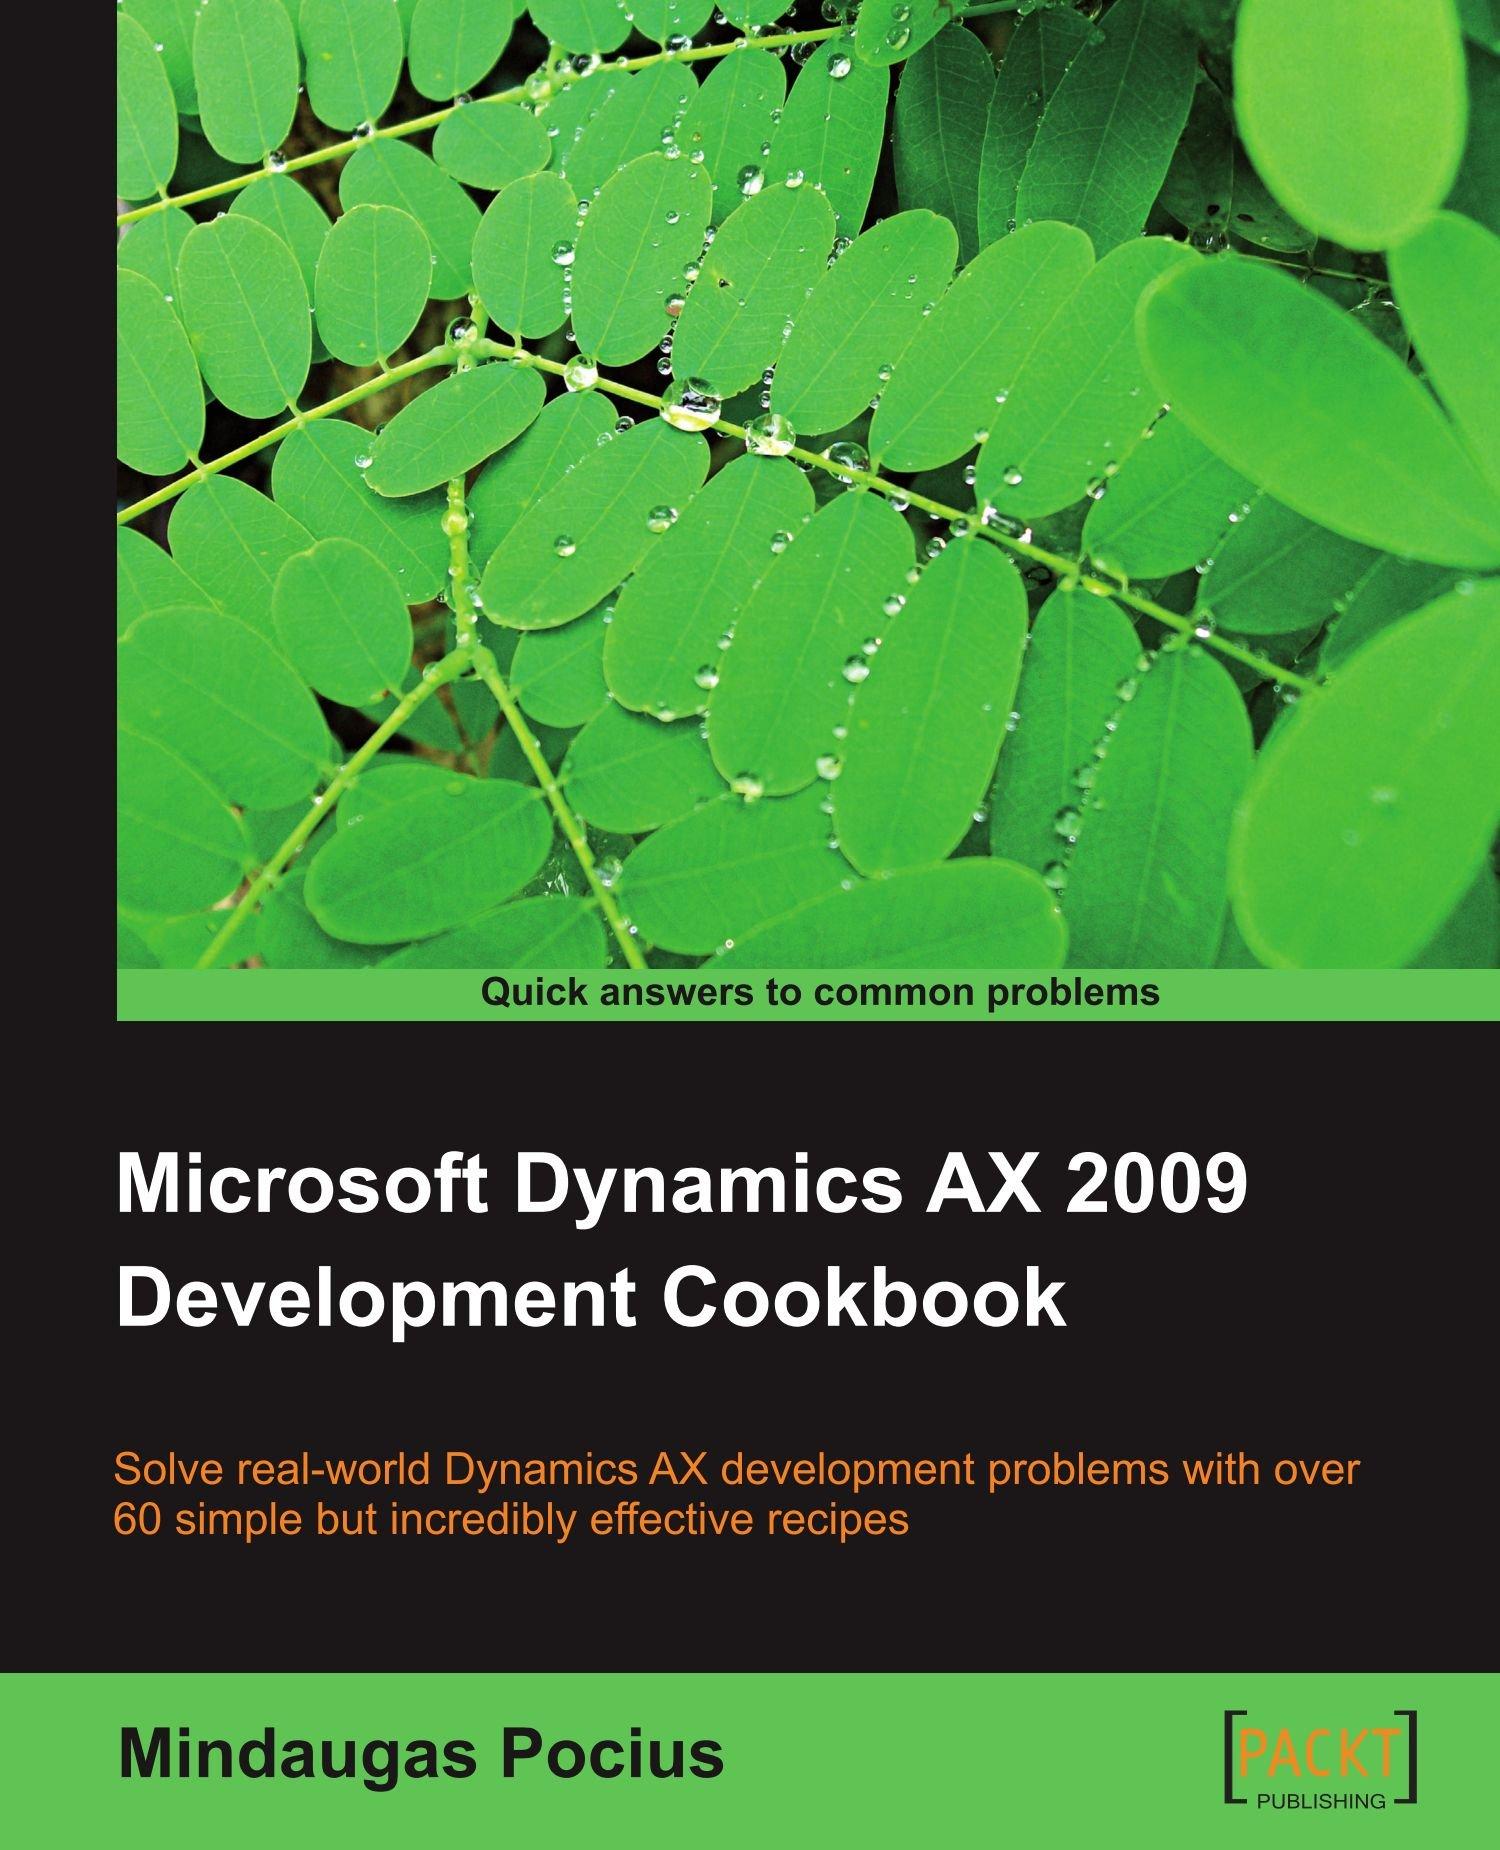 Ax pre requisites to install dynamics ax 2009 and enterprise portal - Microsoft Dynamics Ax 2009 Development Cookbook Mindaugas Pocius 9781847199423 Amazon Com Books